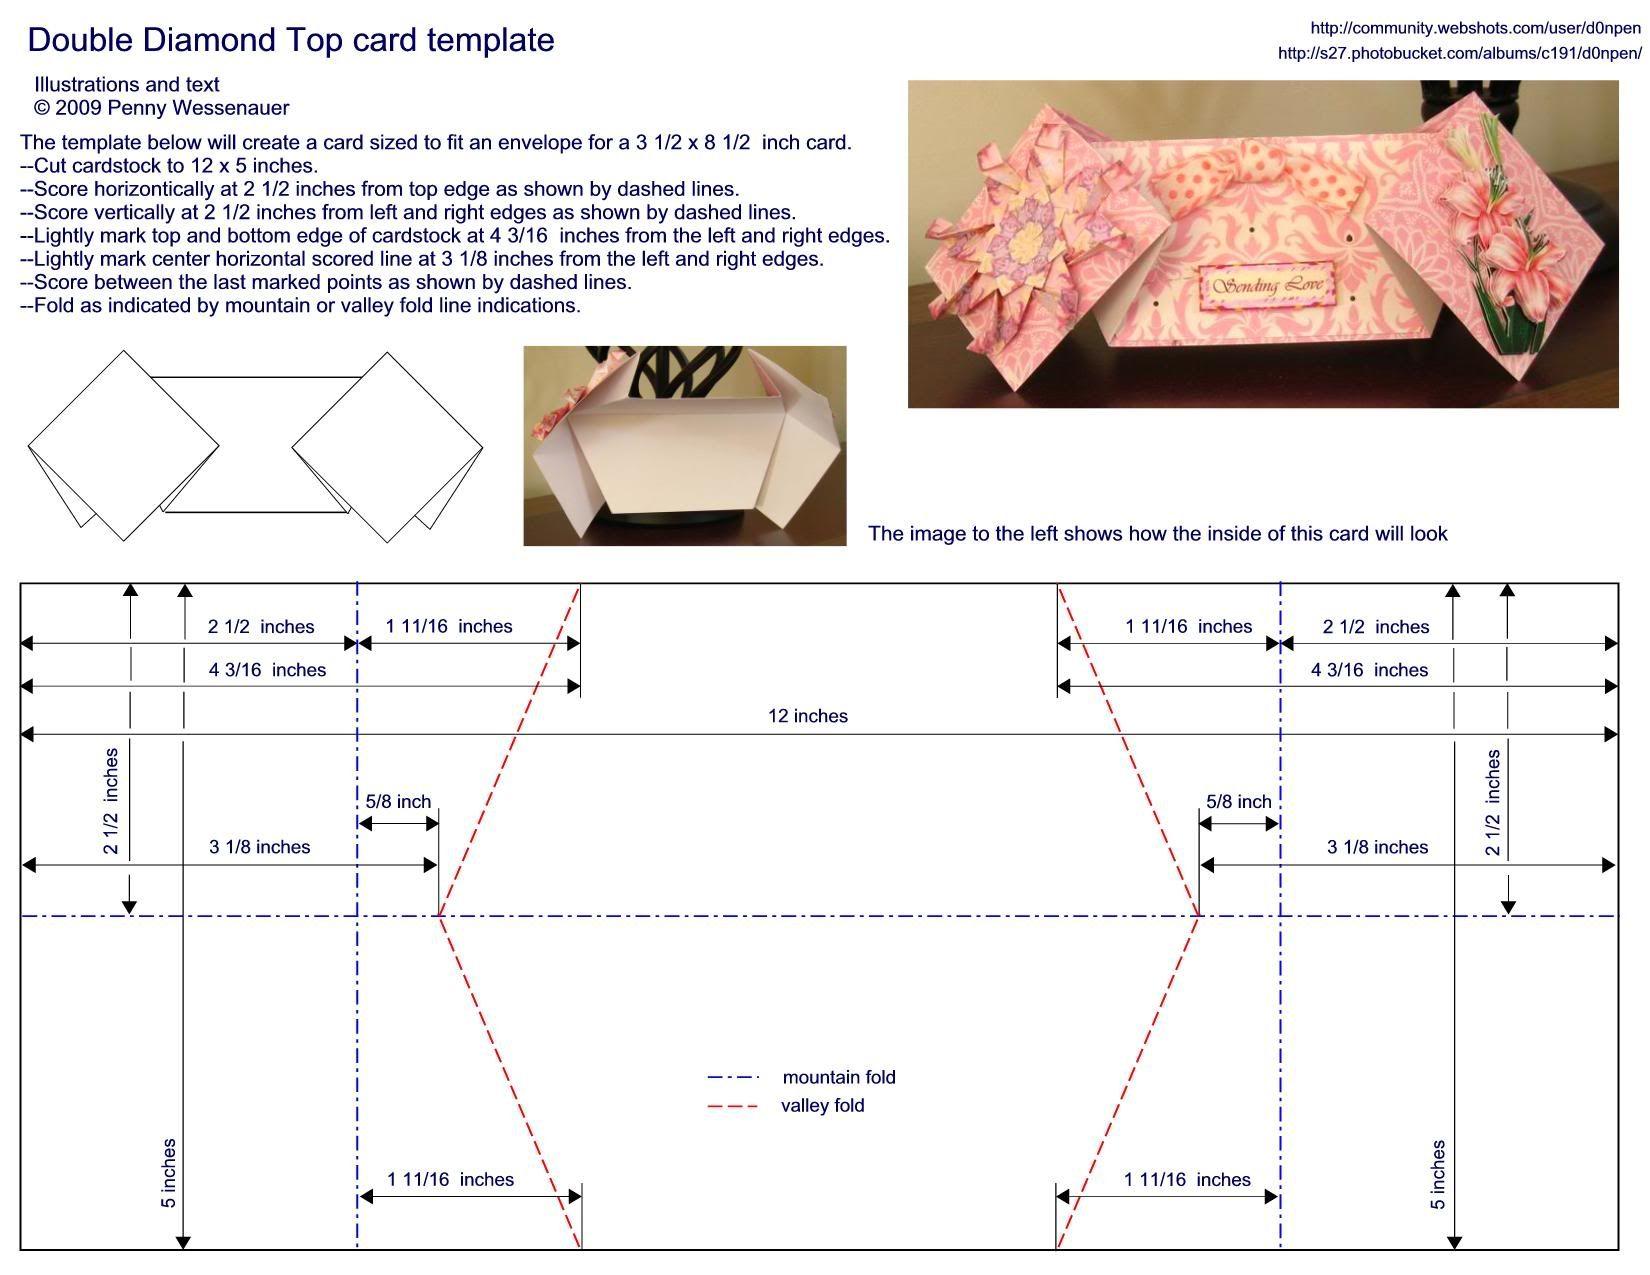 Card Templates Slideshow By D0npen Photobucket Card Templates Step Cards Side Step Card